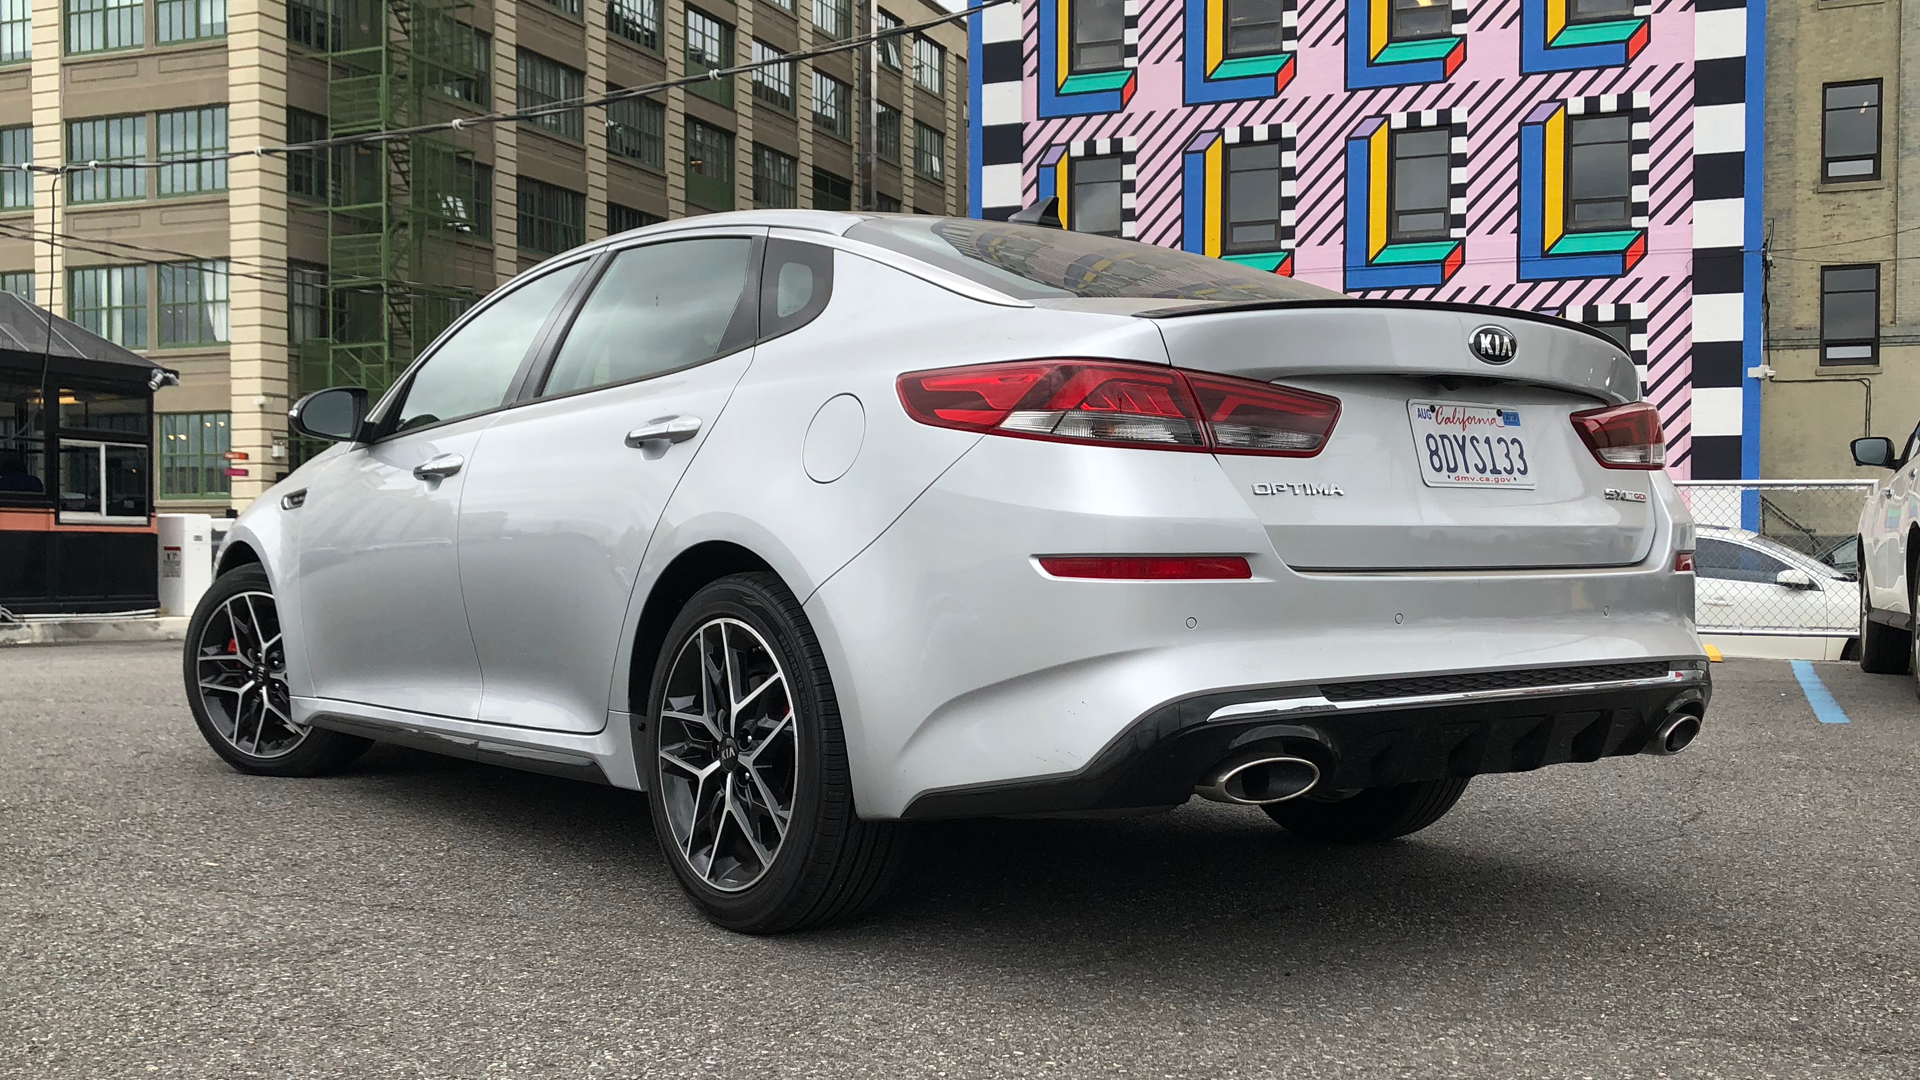 2019 Kia Optima Sx Test Drive Review A Sporty Turbocharged Family Rear Spoiler Erica Lourd